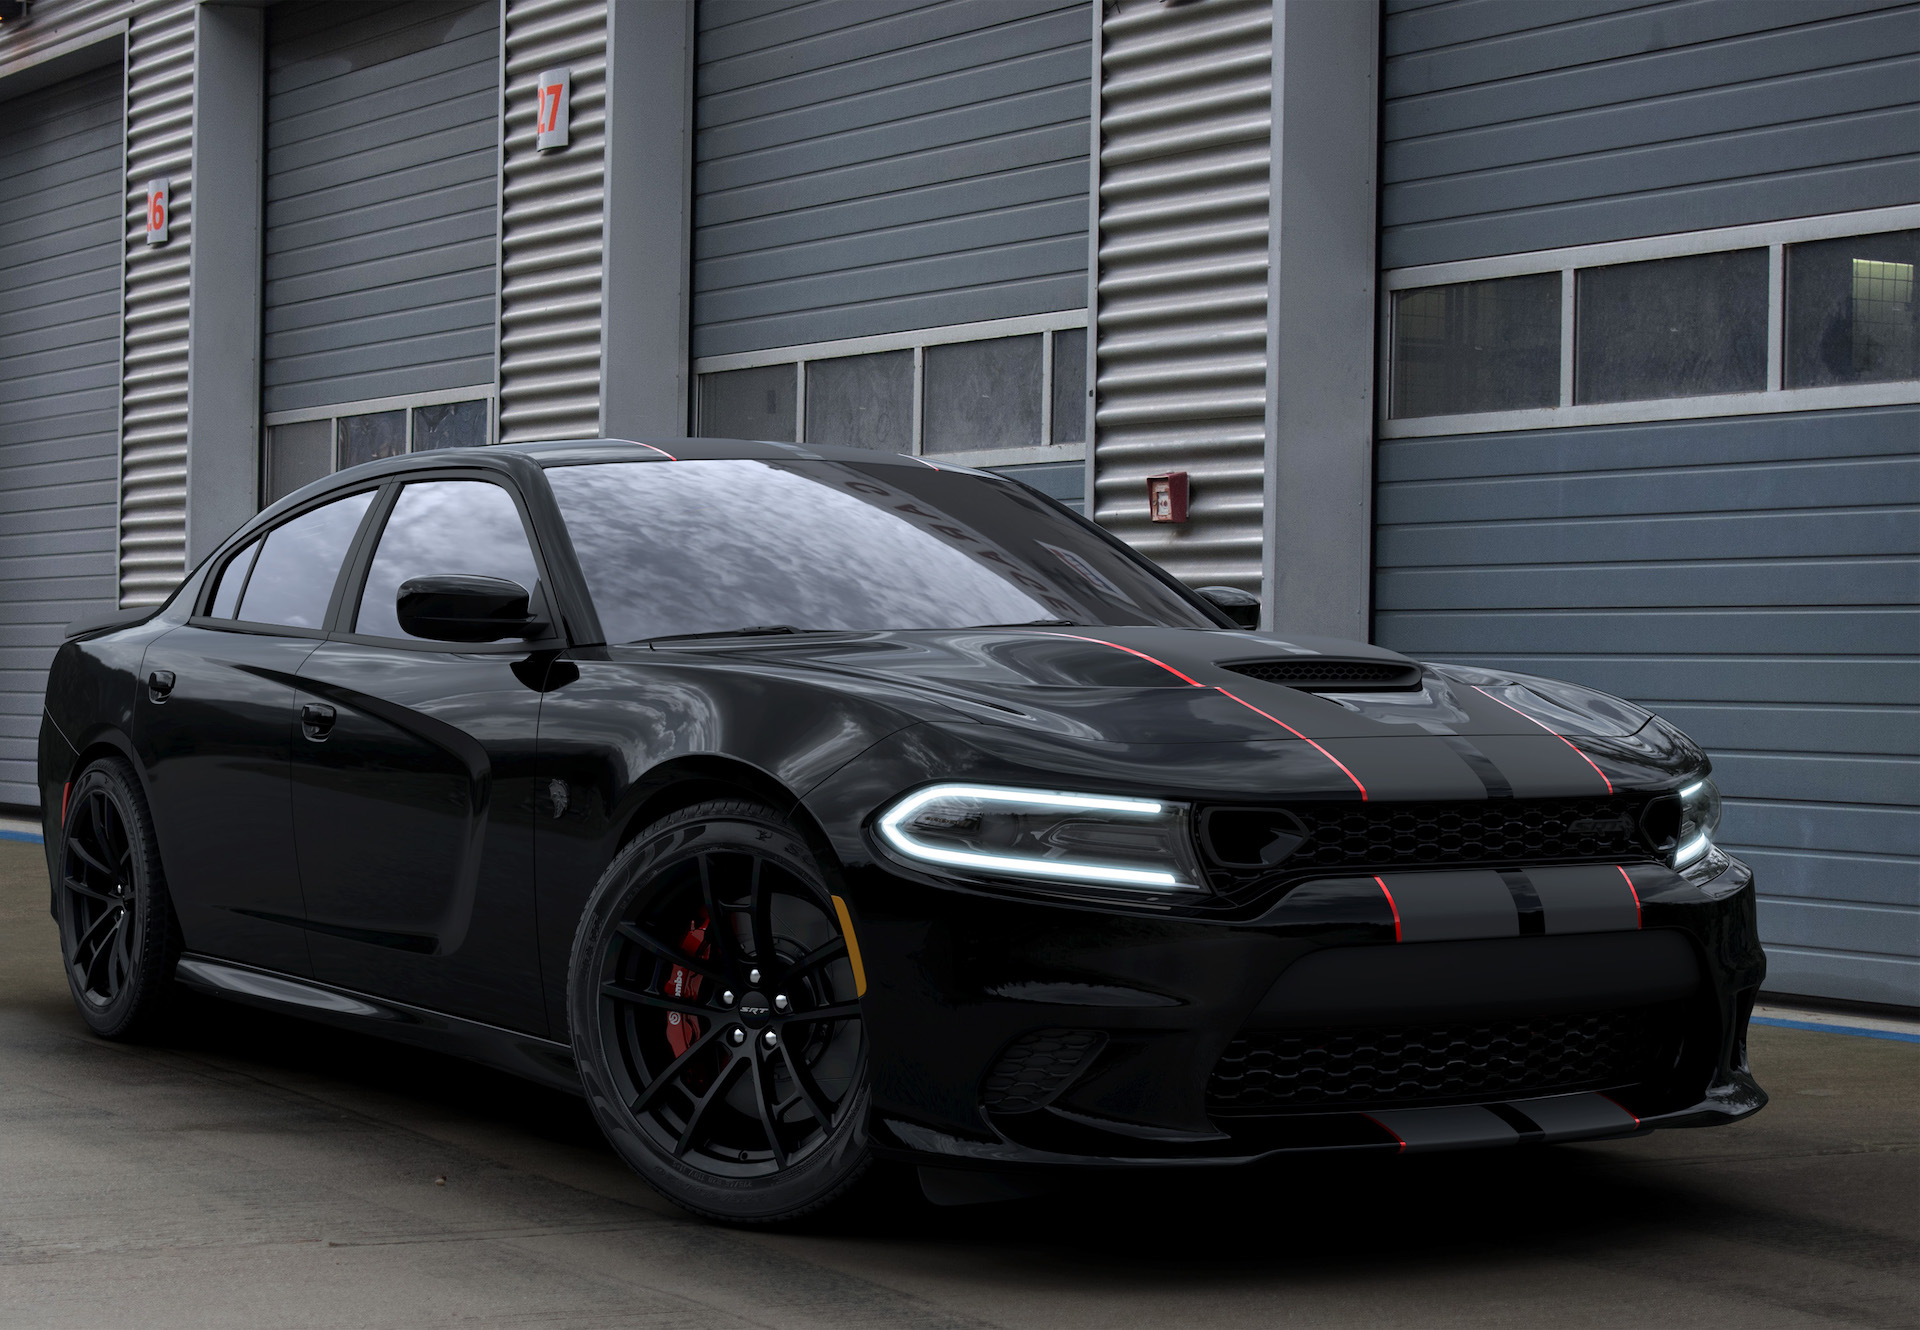 2019 Dodge Charger Srt Hellcat Octane Edition Fuels The Blackout Trend